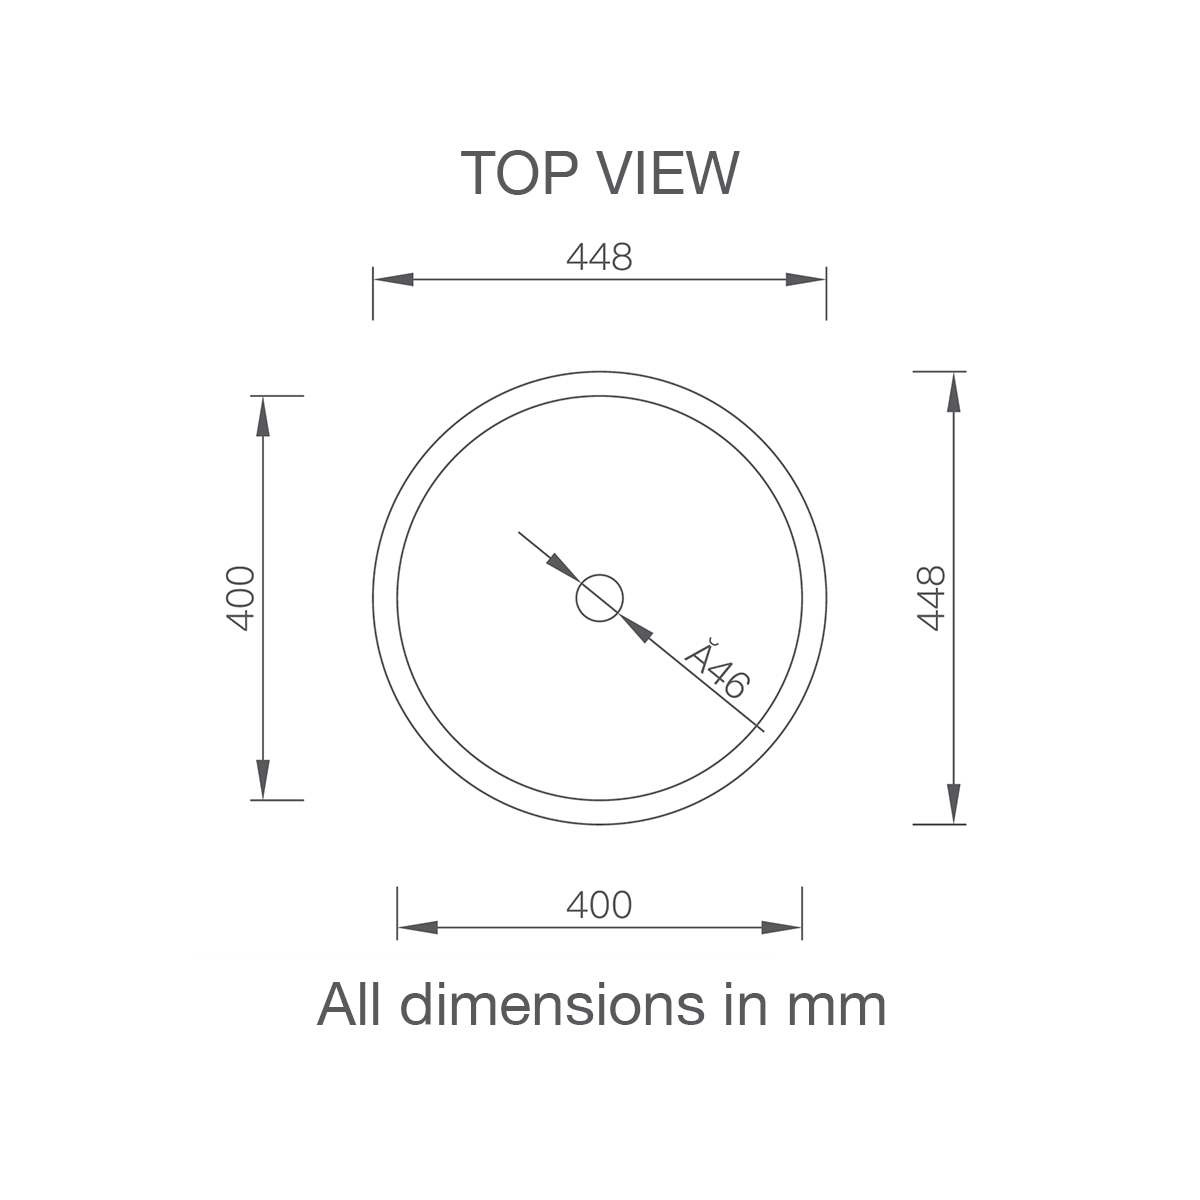 202-top.jpg